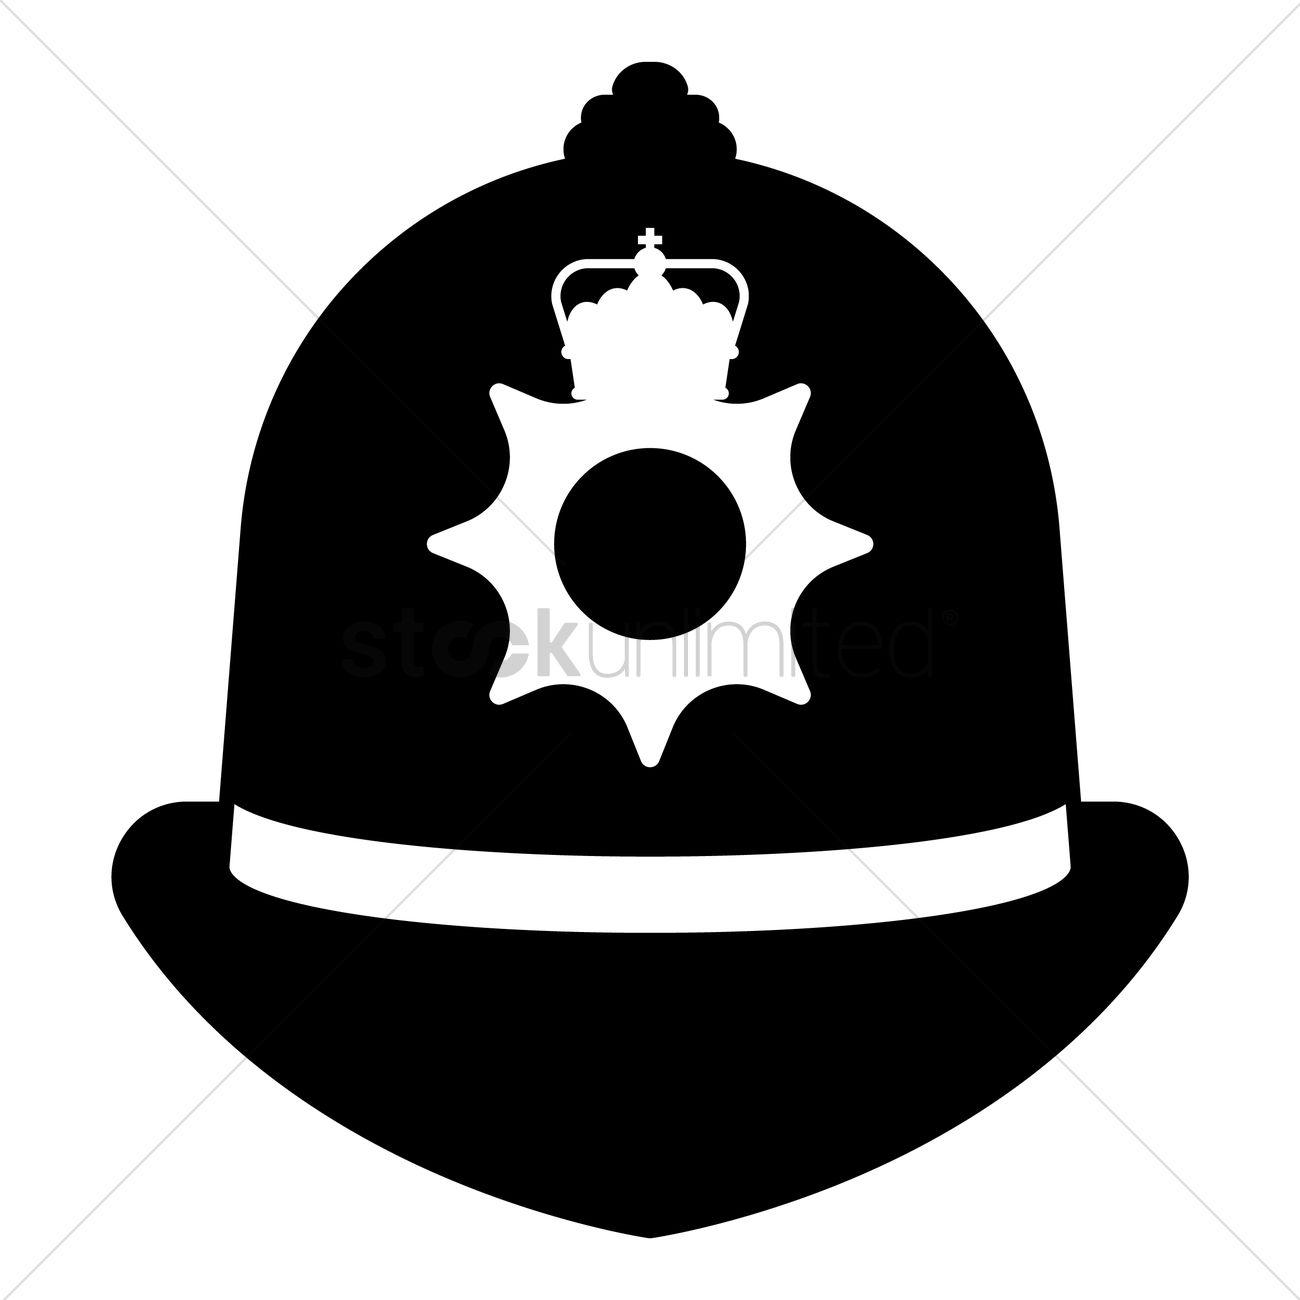 Police cap clipart jpg black and white download Uk United Kingdom Britain Britains British England Hat Hats ... jpg black and white download